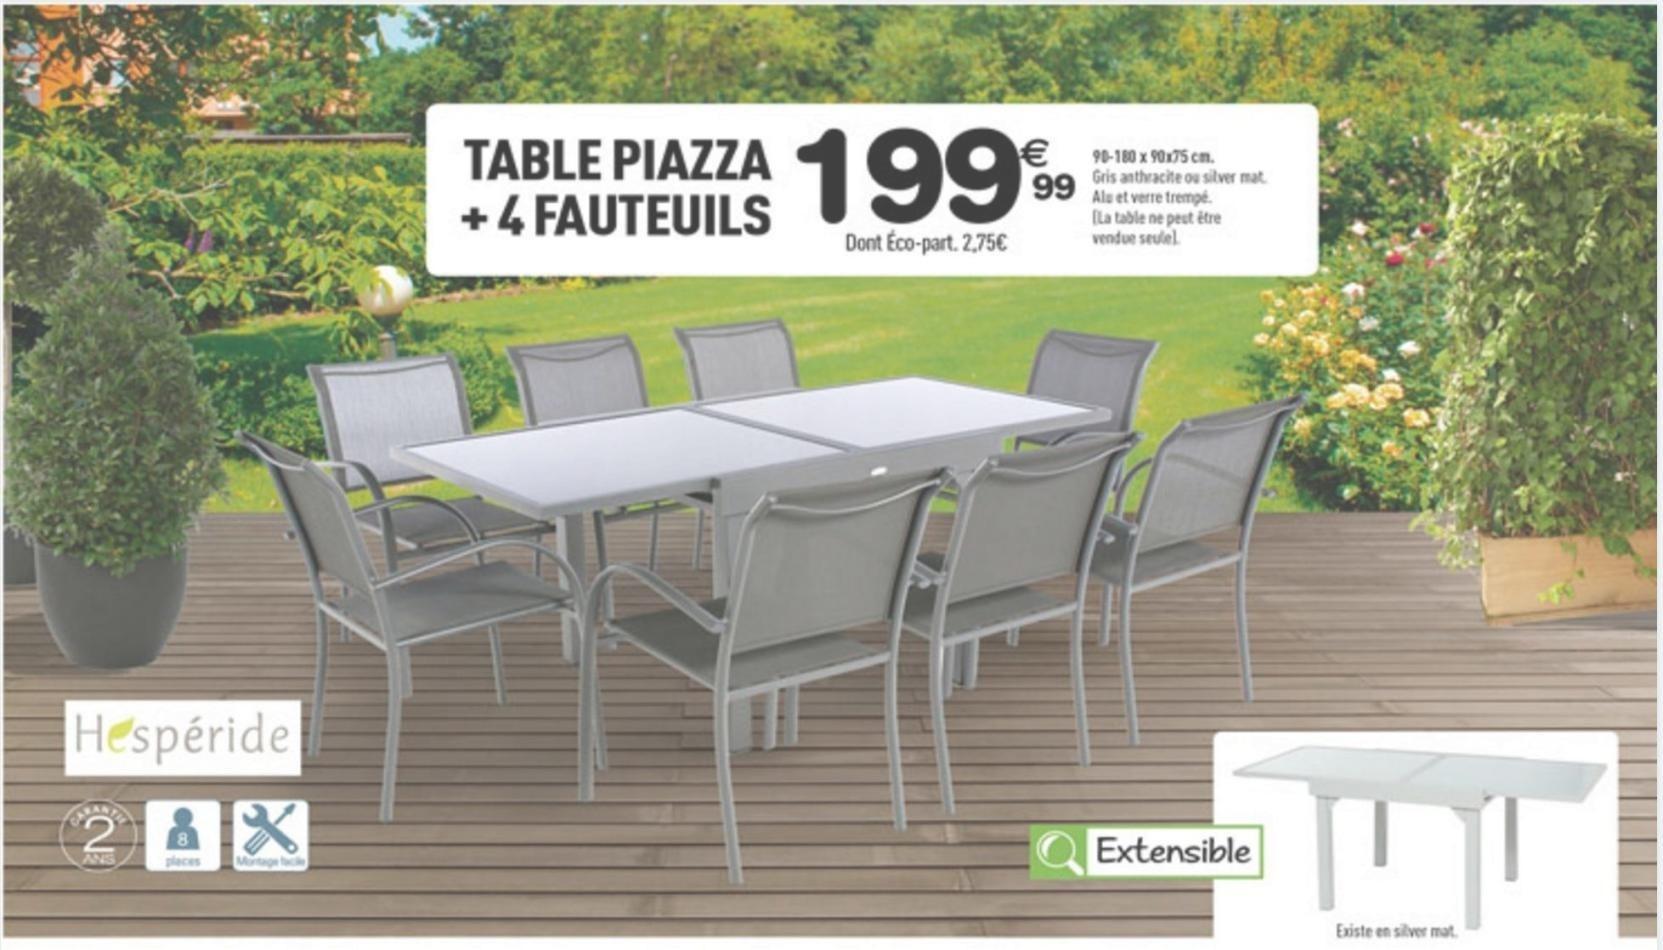 Table Centrakor Table De Table Centrakor De Hesperide ... concernant Table De Jardin Centrakor